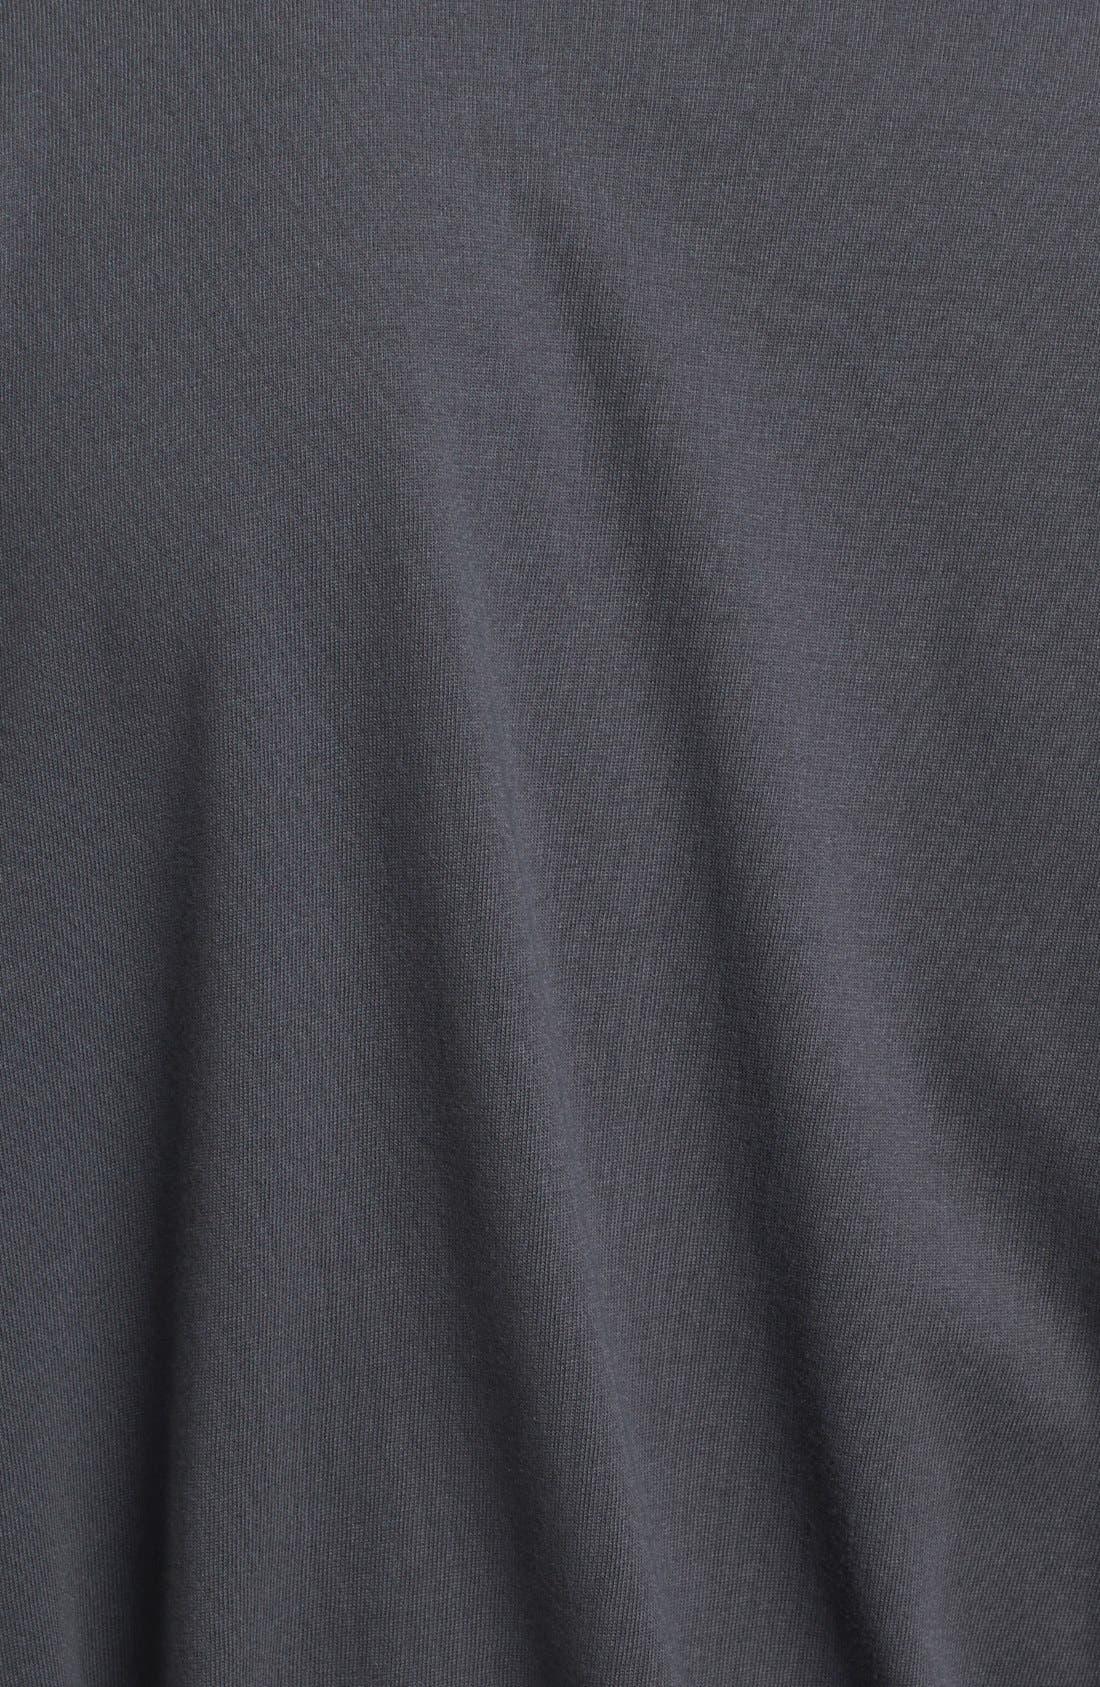 Alternate Image 3  - BOSS HUGO BOSS 'Innovation 4' Robe